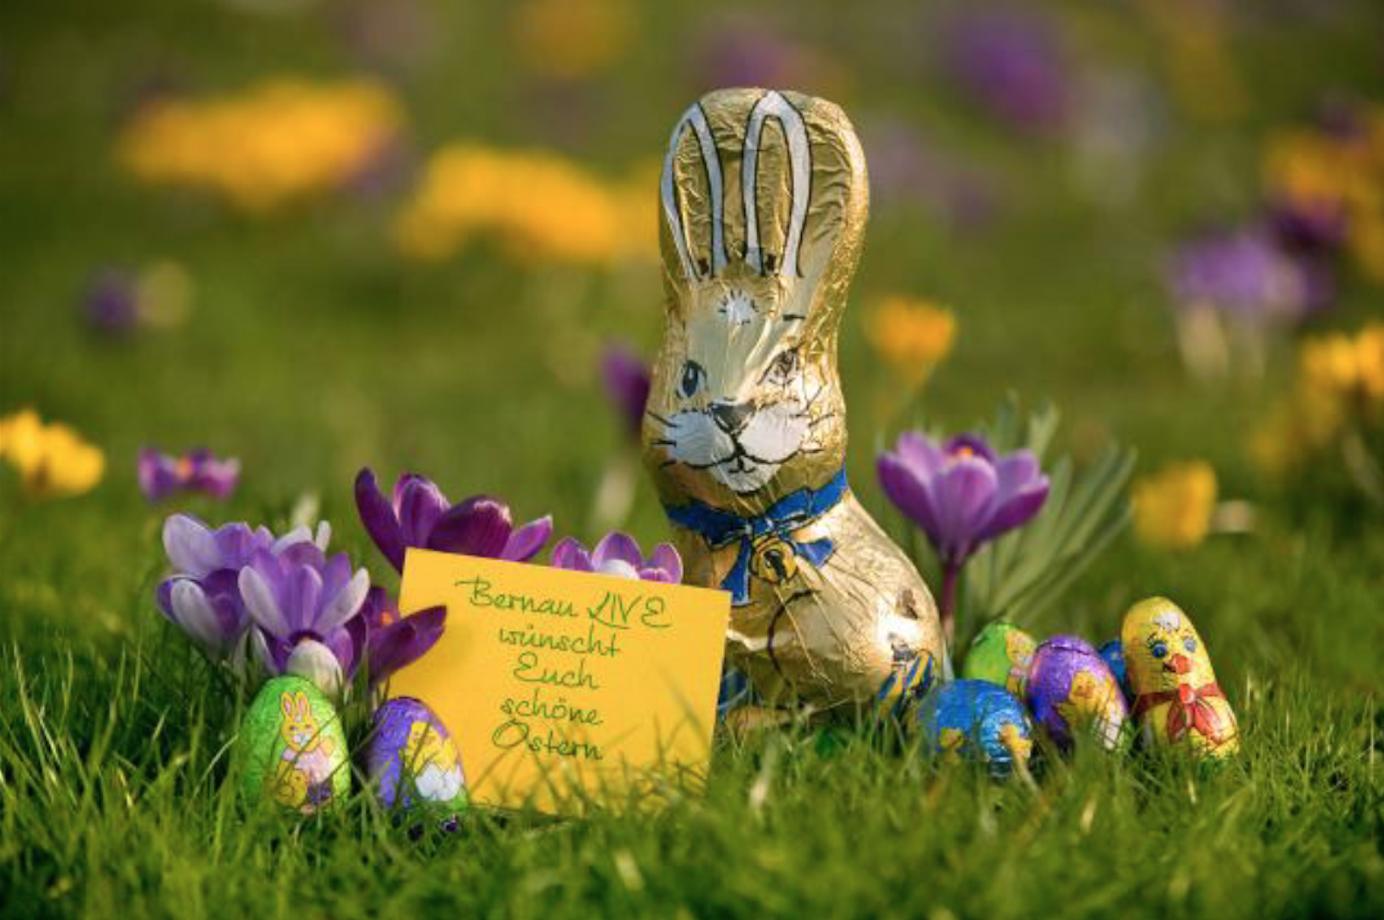 Wir Wünschen Euch Schöne Ostern Lg Bernau Live Bernau Live